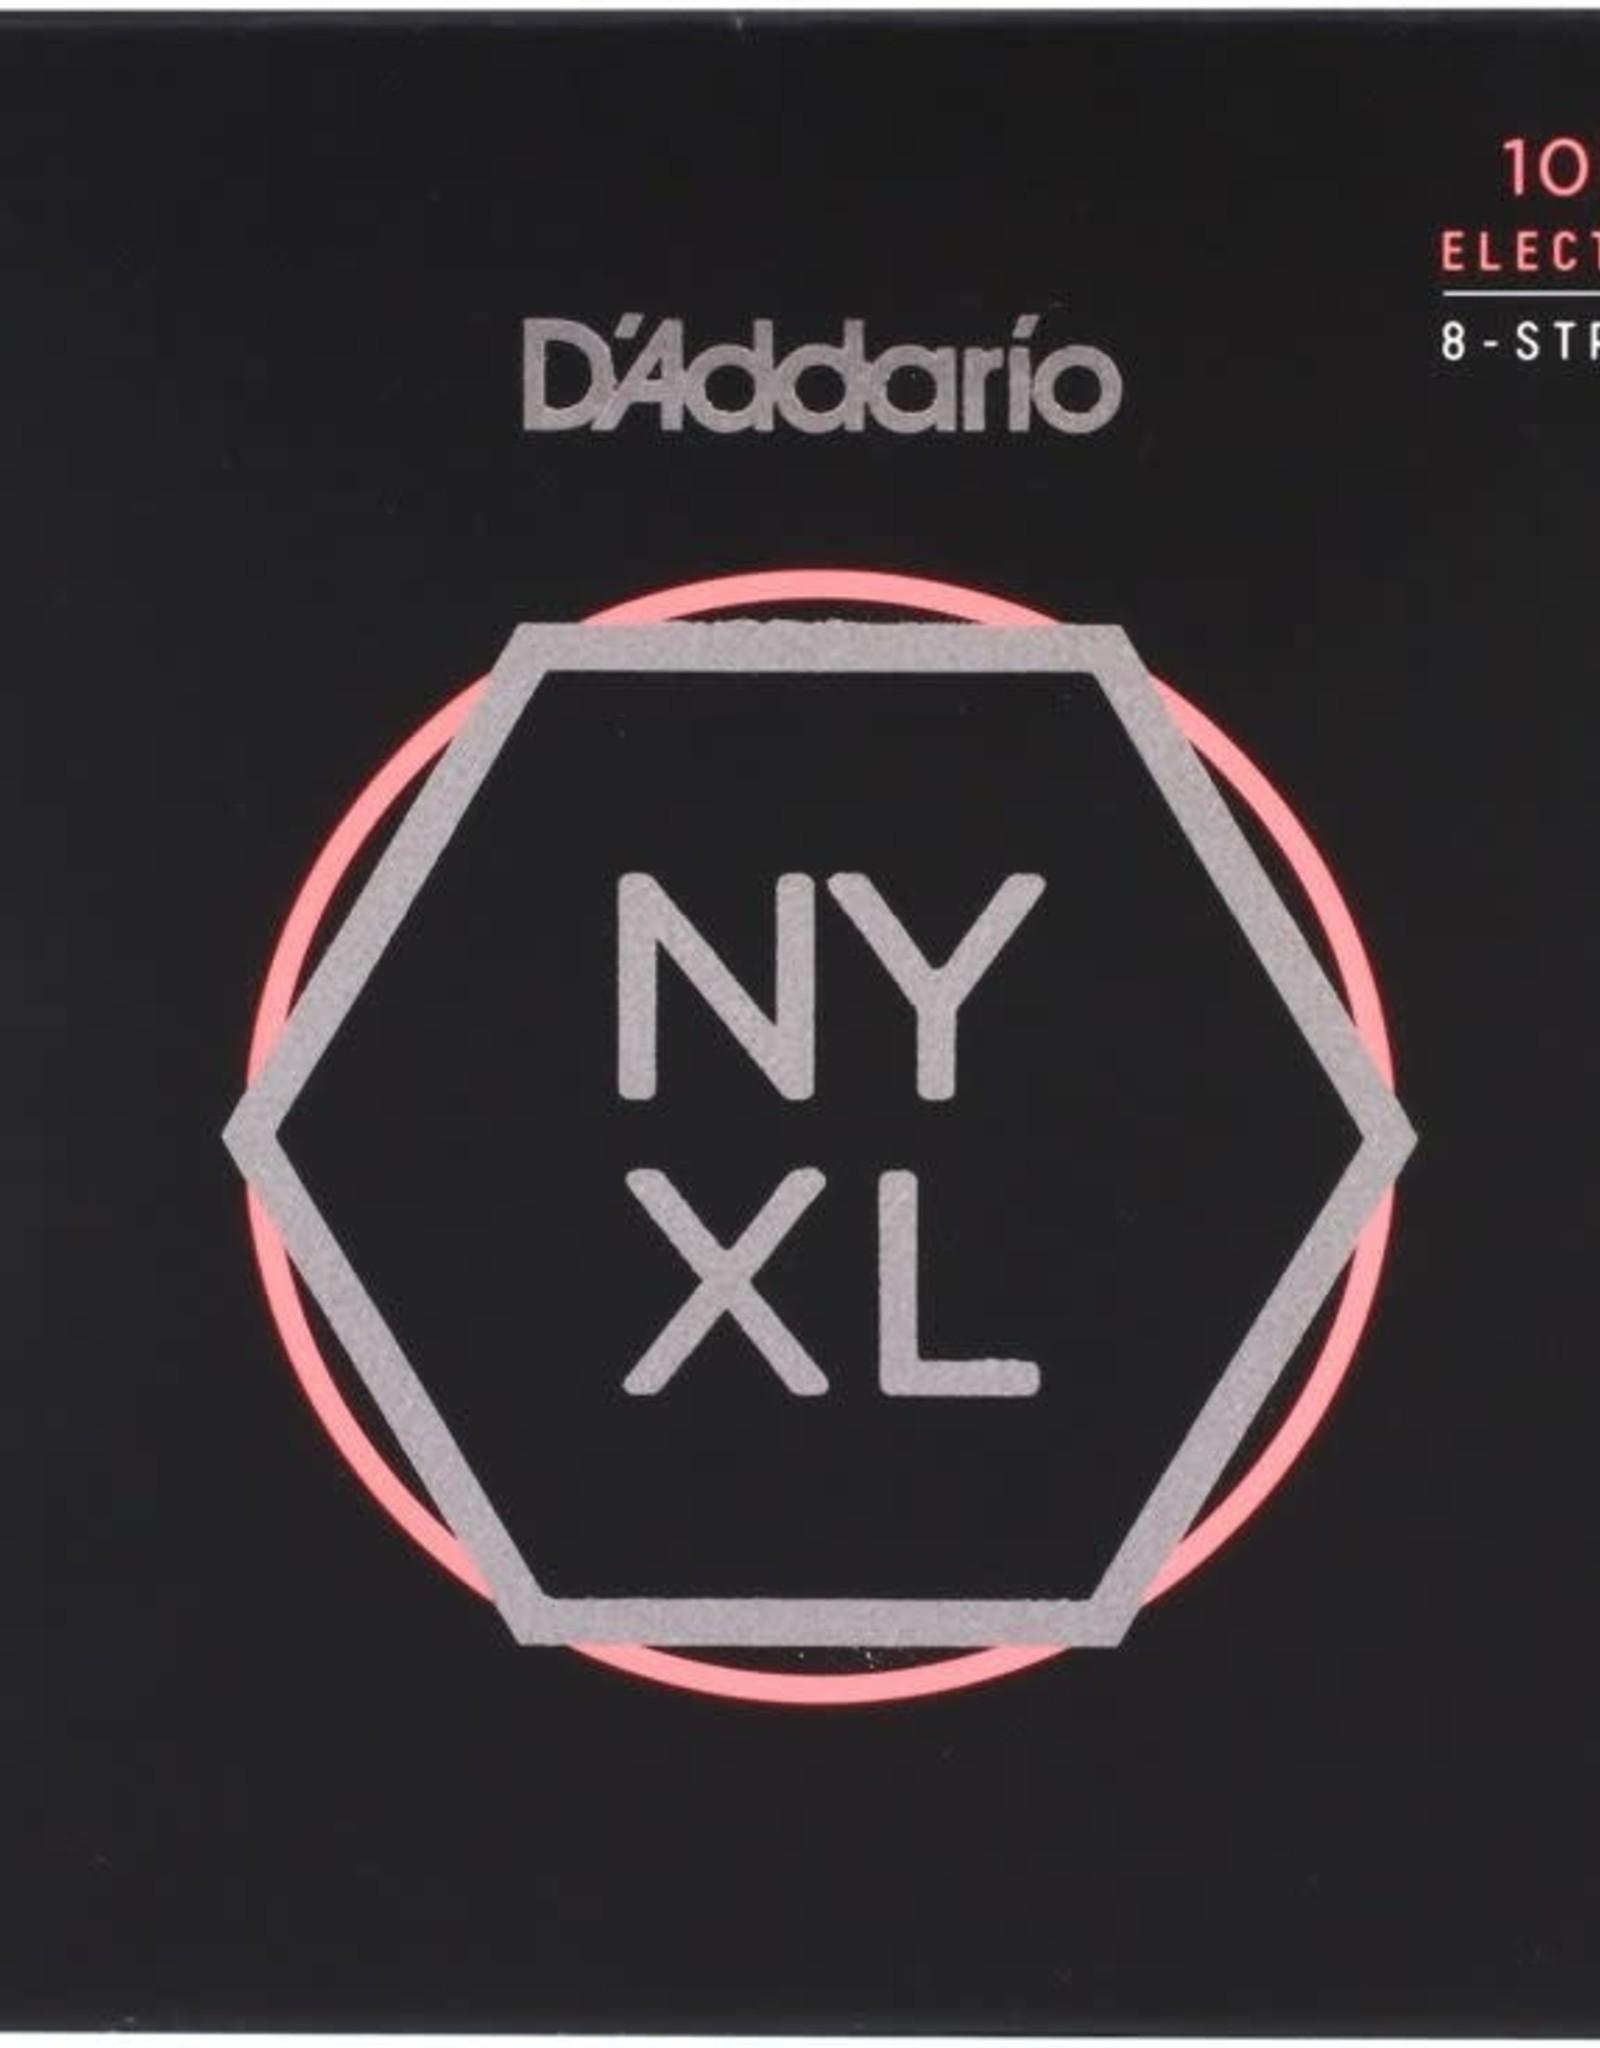 D'Addario D'Addario NYXL1074 Nickel Wound 8-String Electric Guitar Strings, Light Top / Heavy Bottom, 10-74